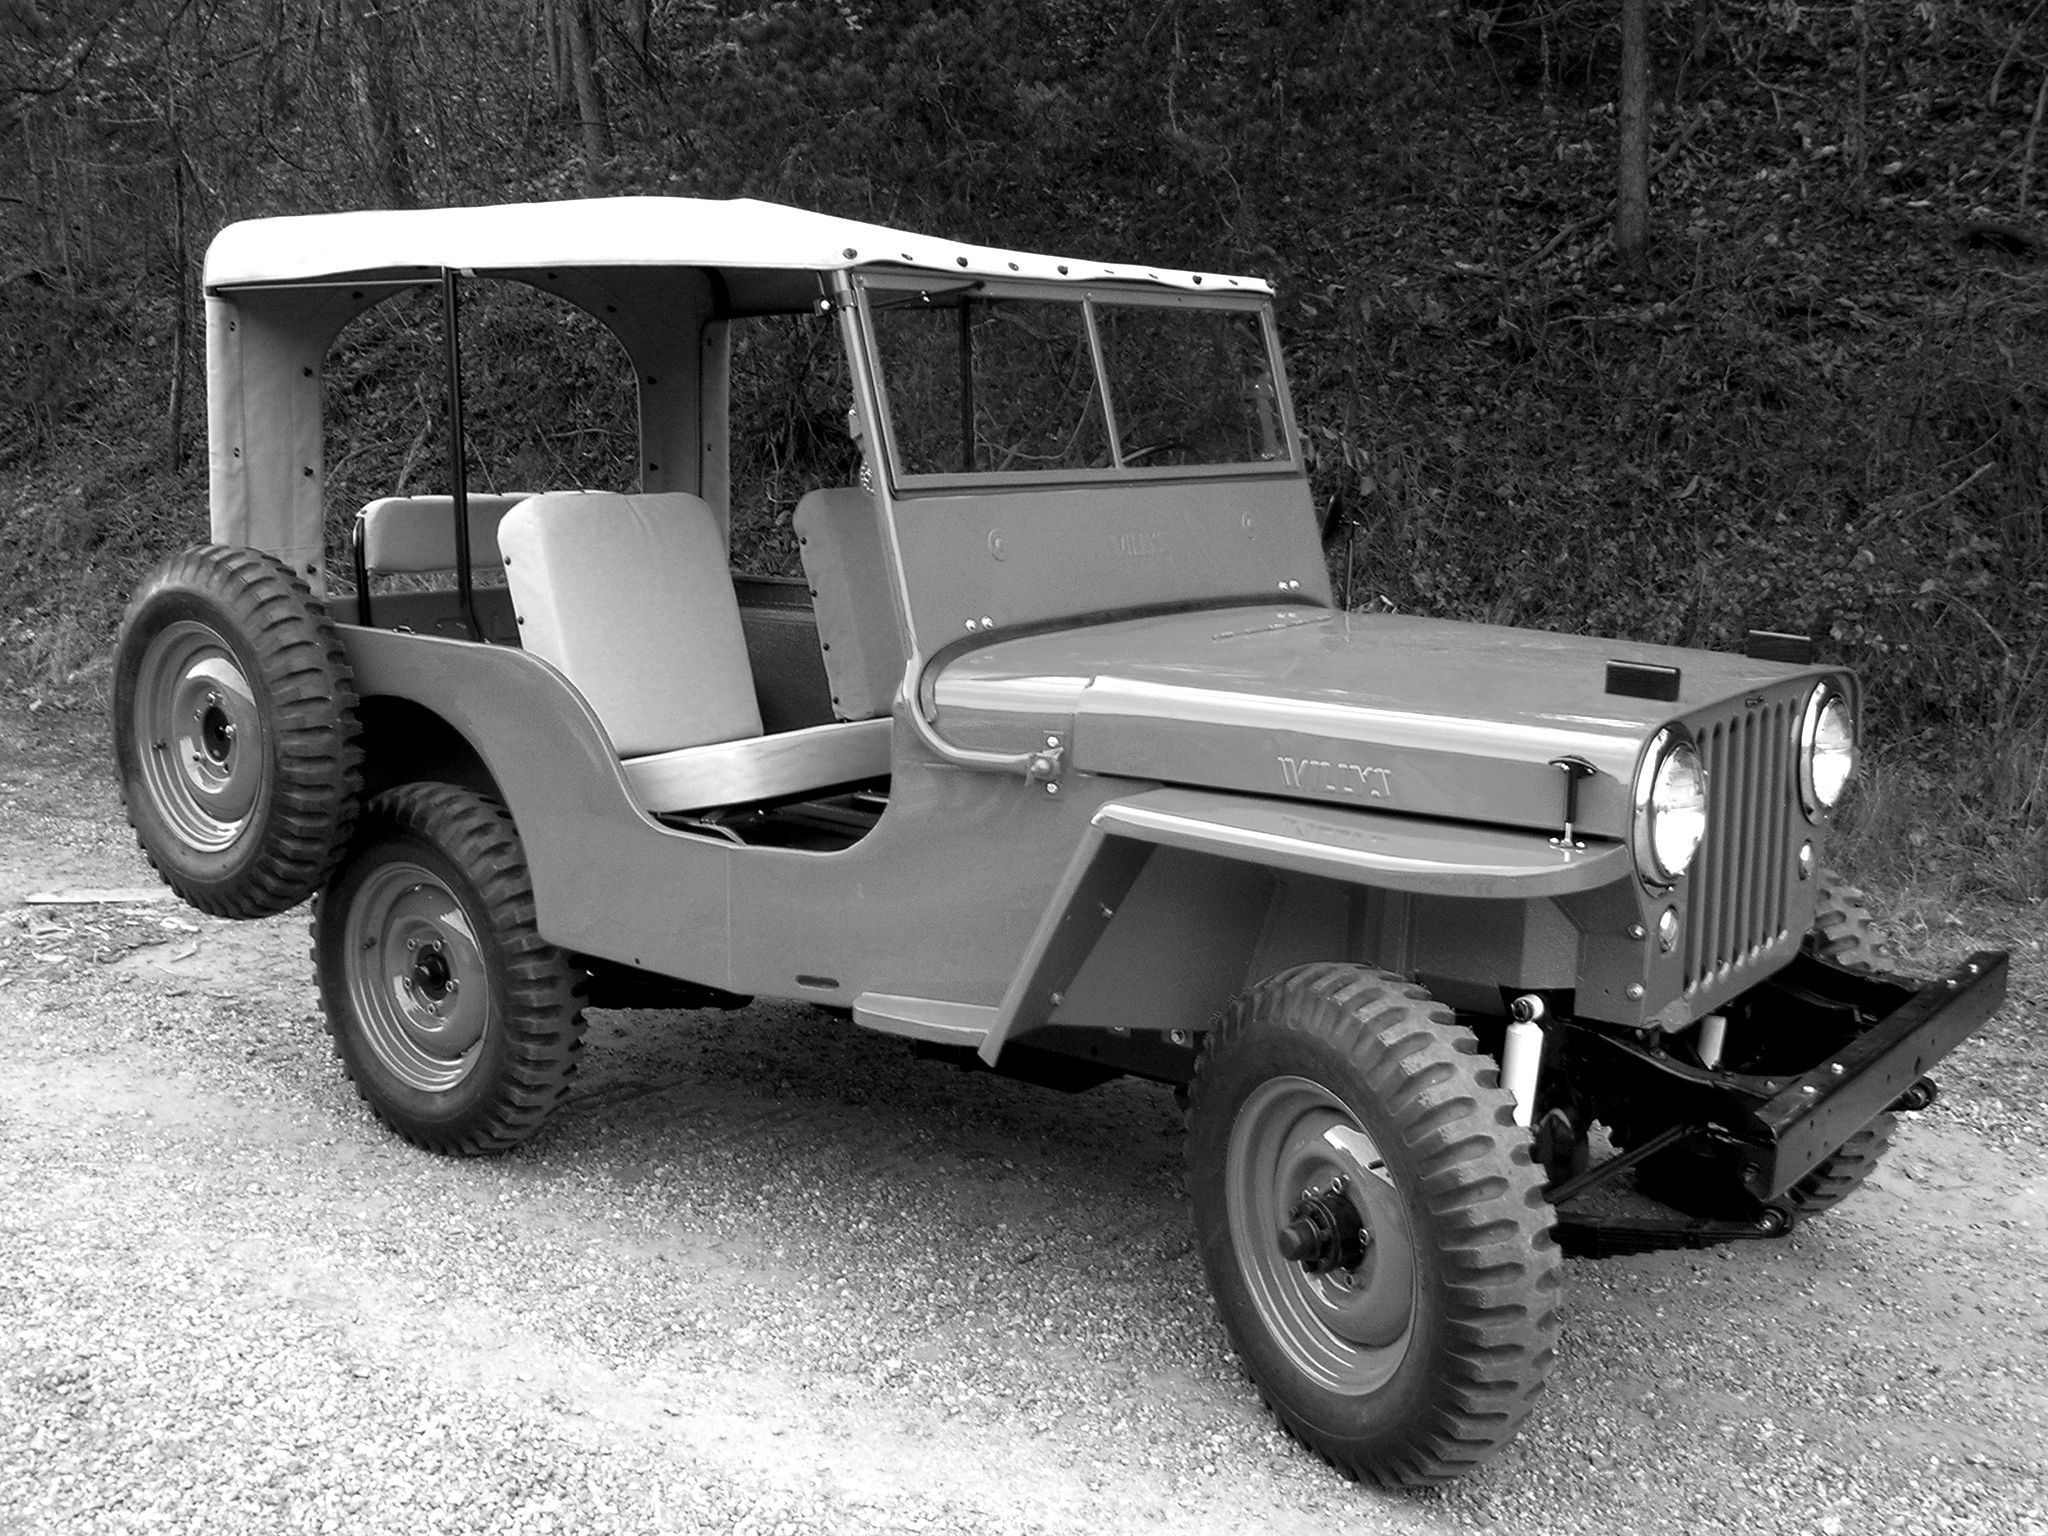 Willys Overland Jeep Cj 2a Love The Side Spare Tire Jeep Cj2a